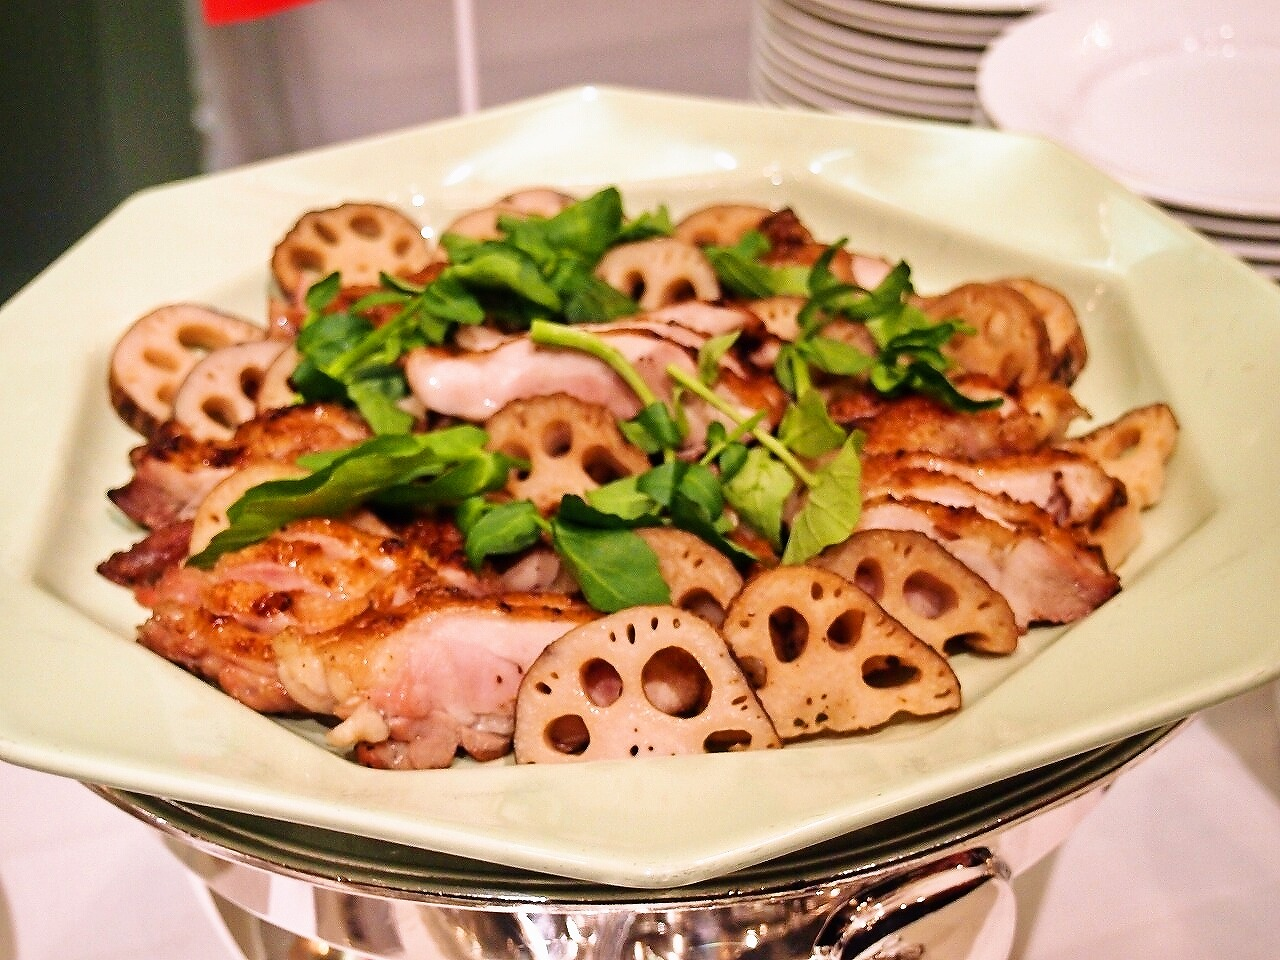 s-foodpic7478874.jpg